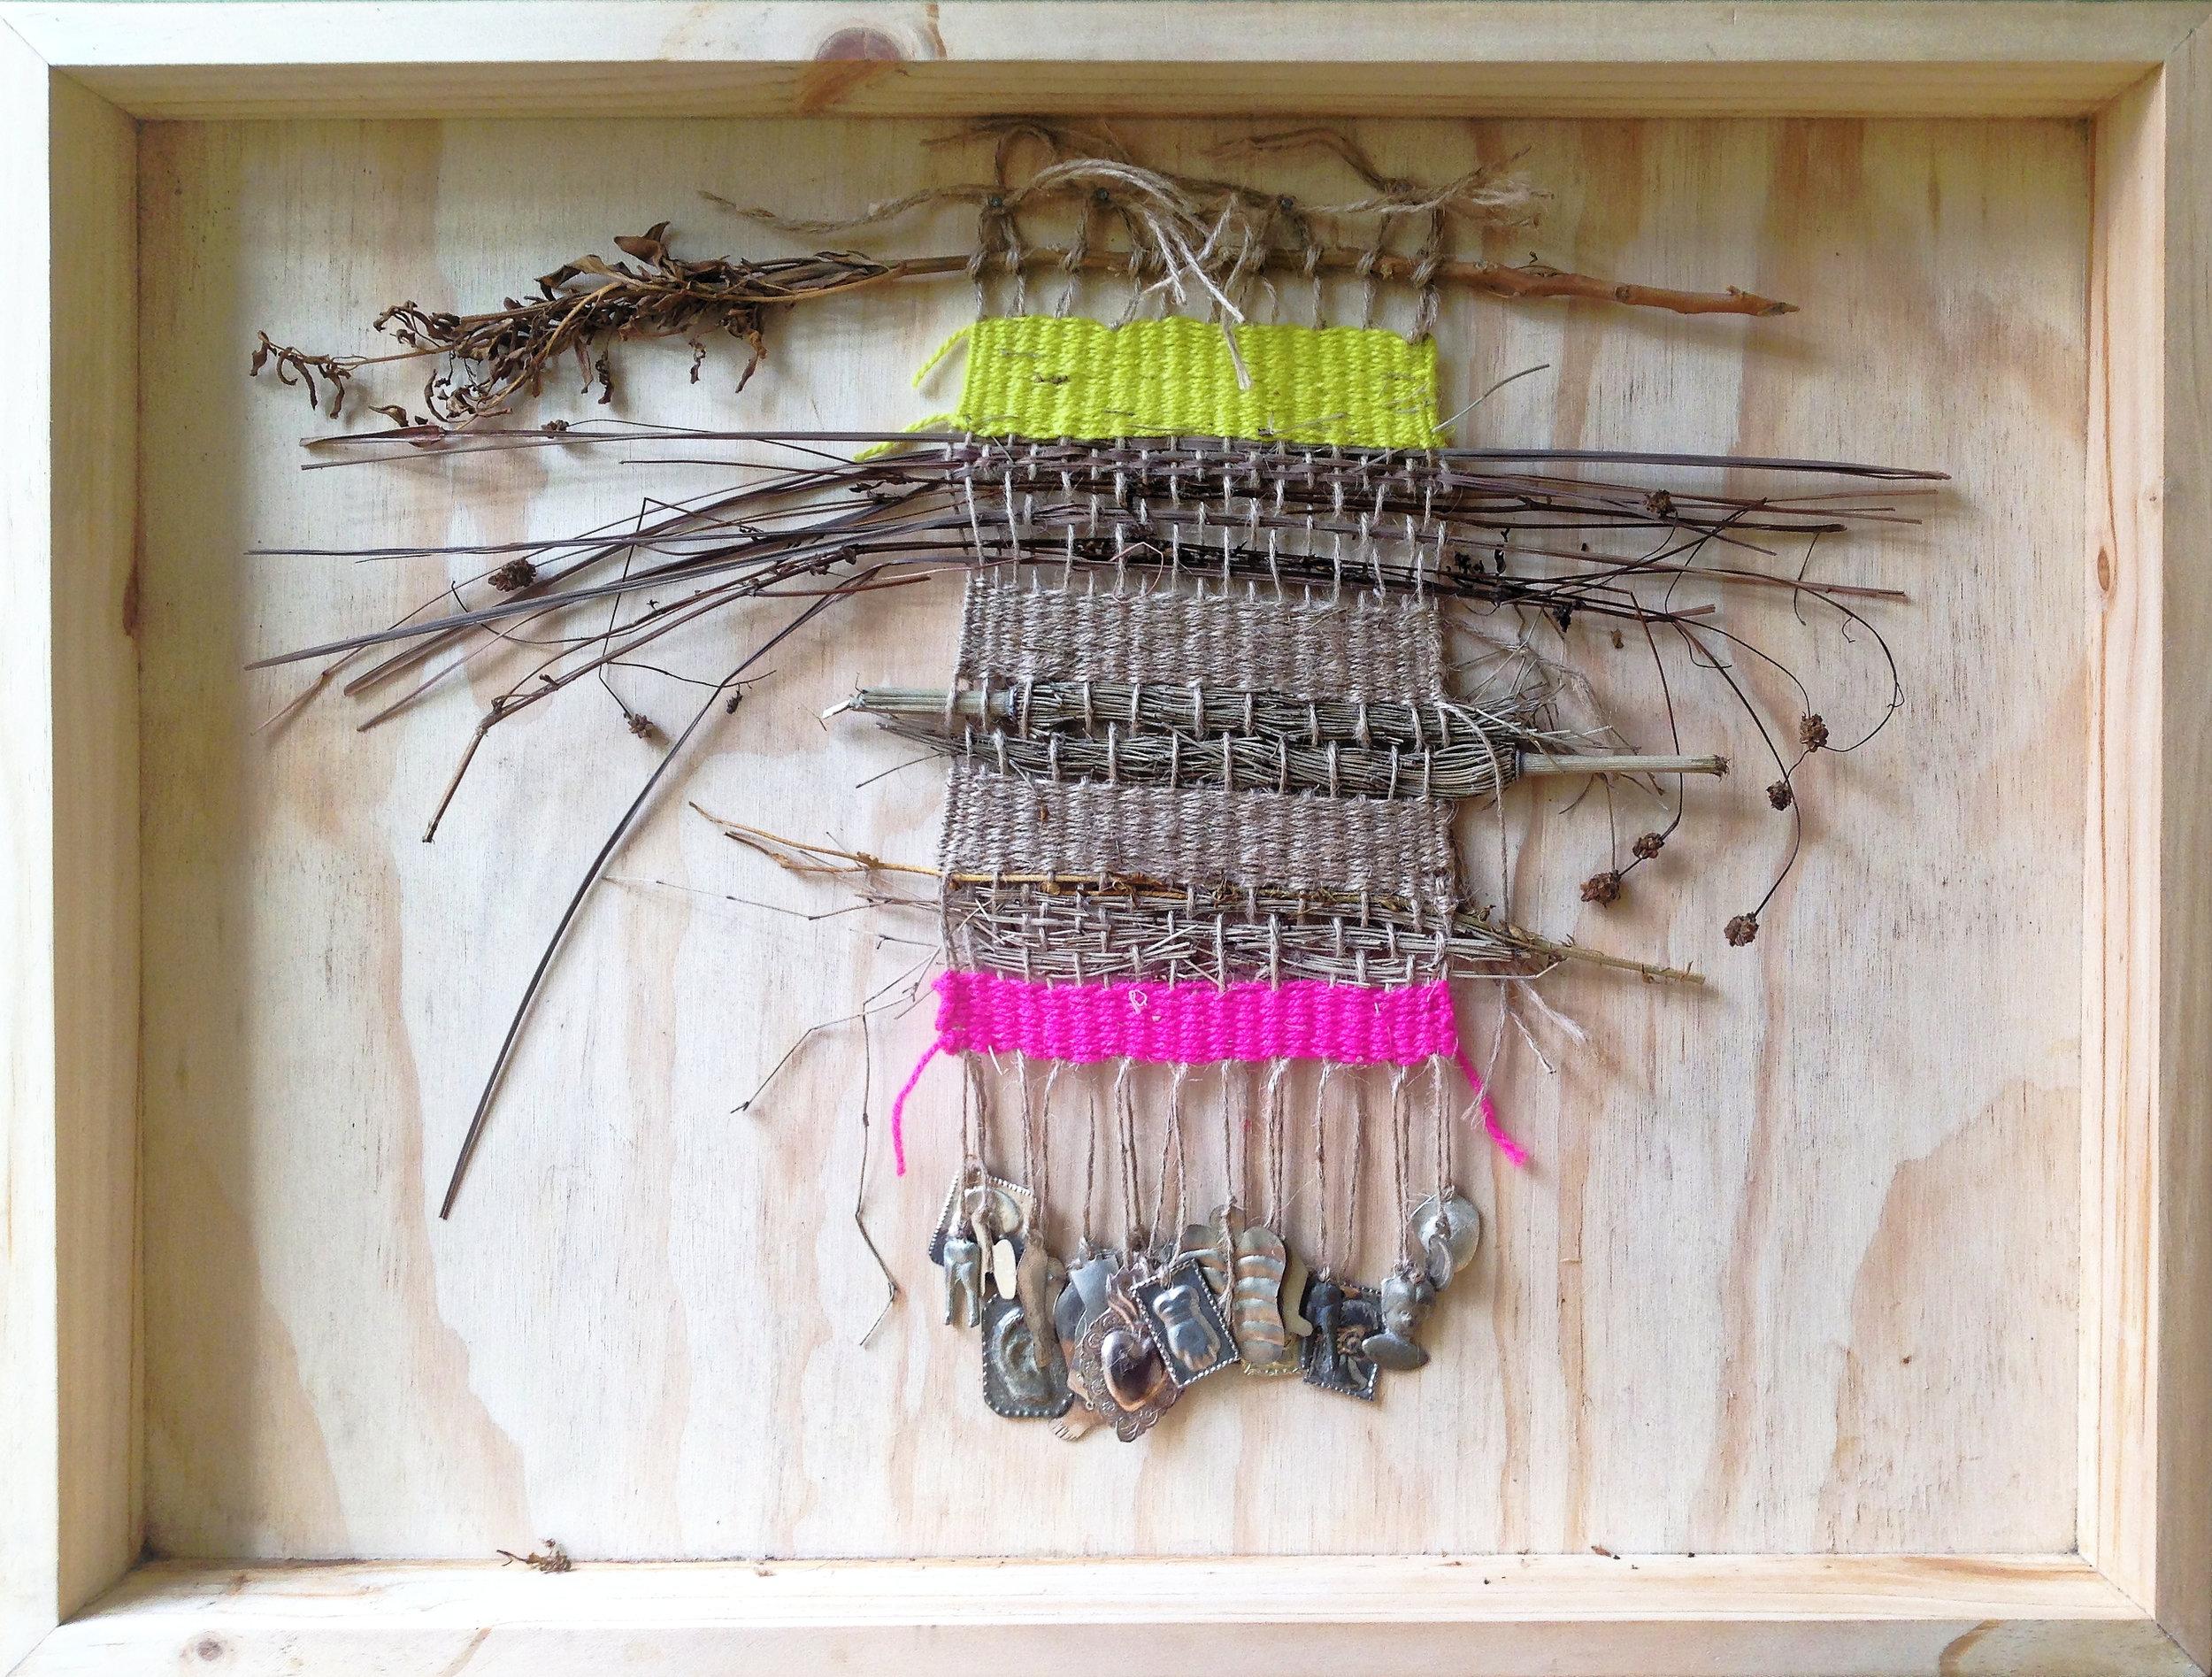 Weaving healing into the textile